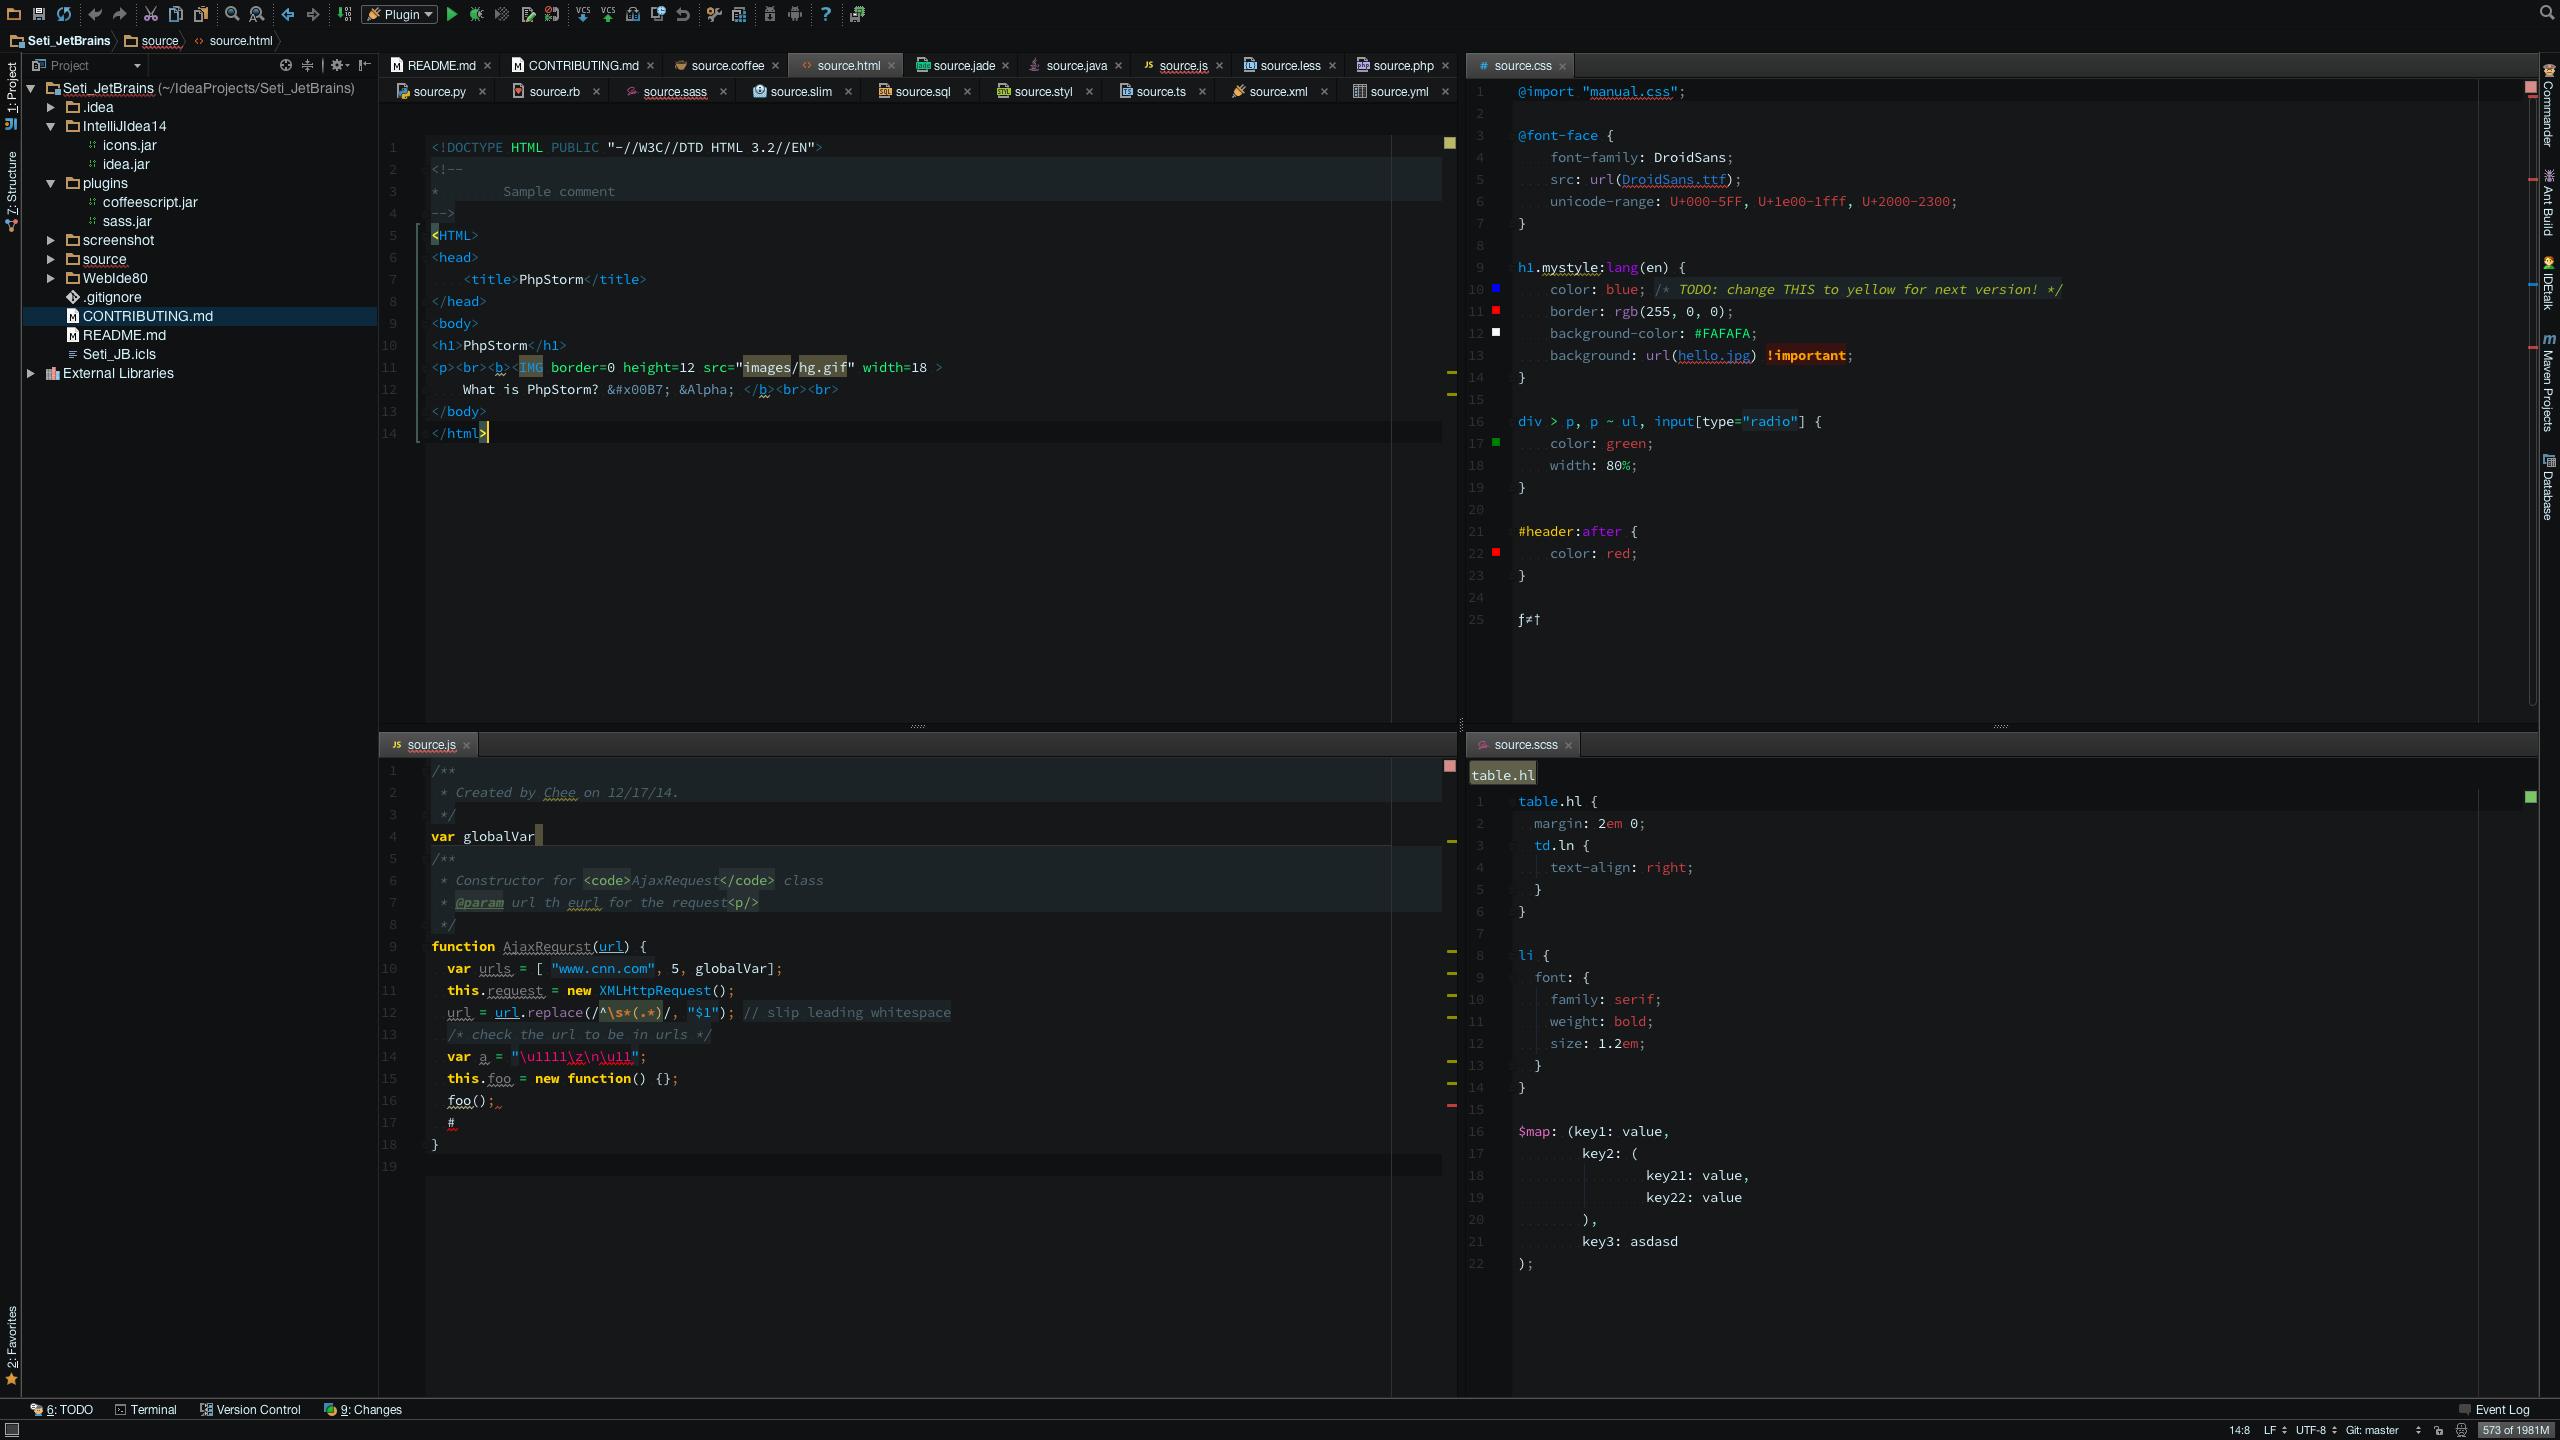 GitHub - zchee/Seti_JetBrains: Seti_UI and Seti_UX themes